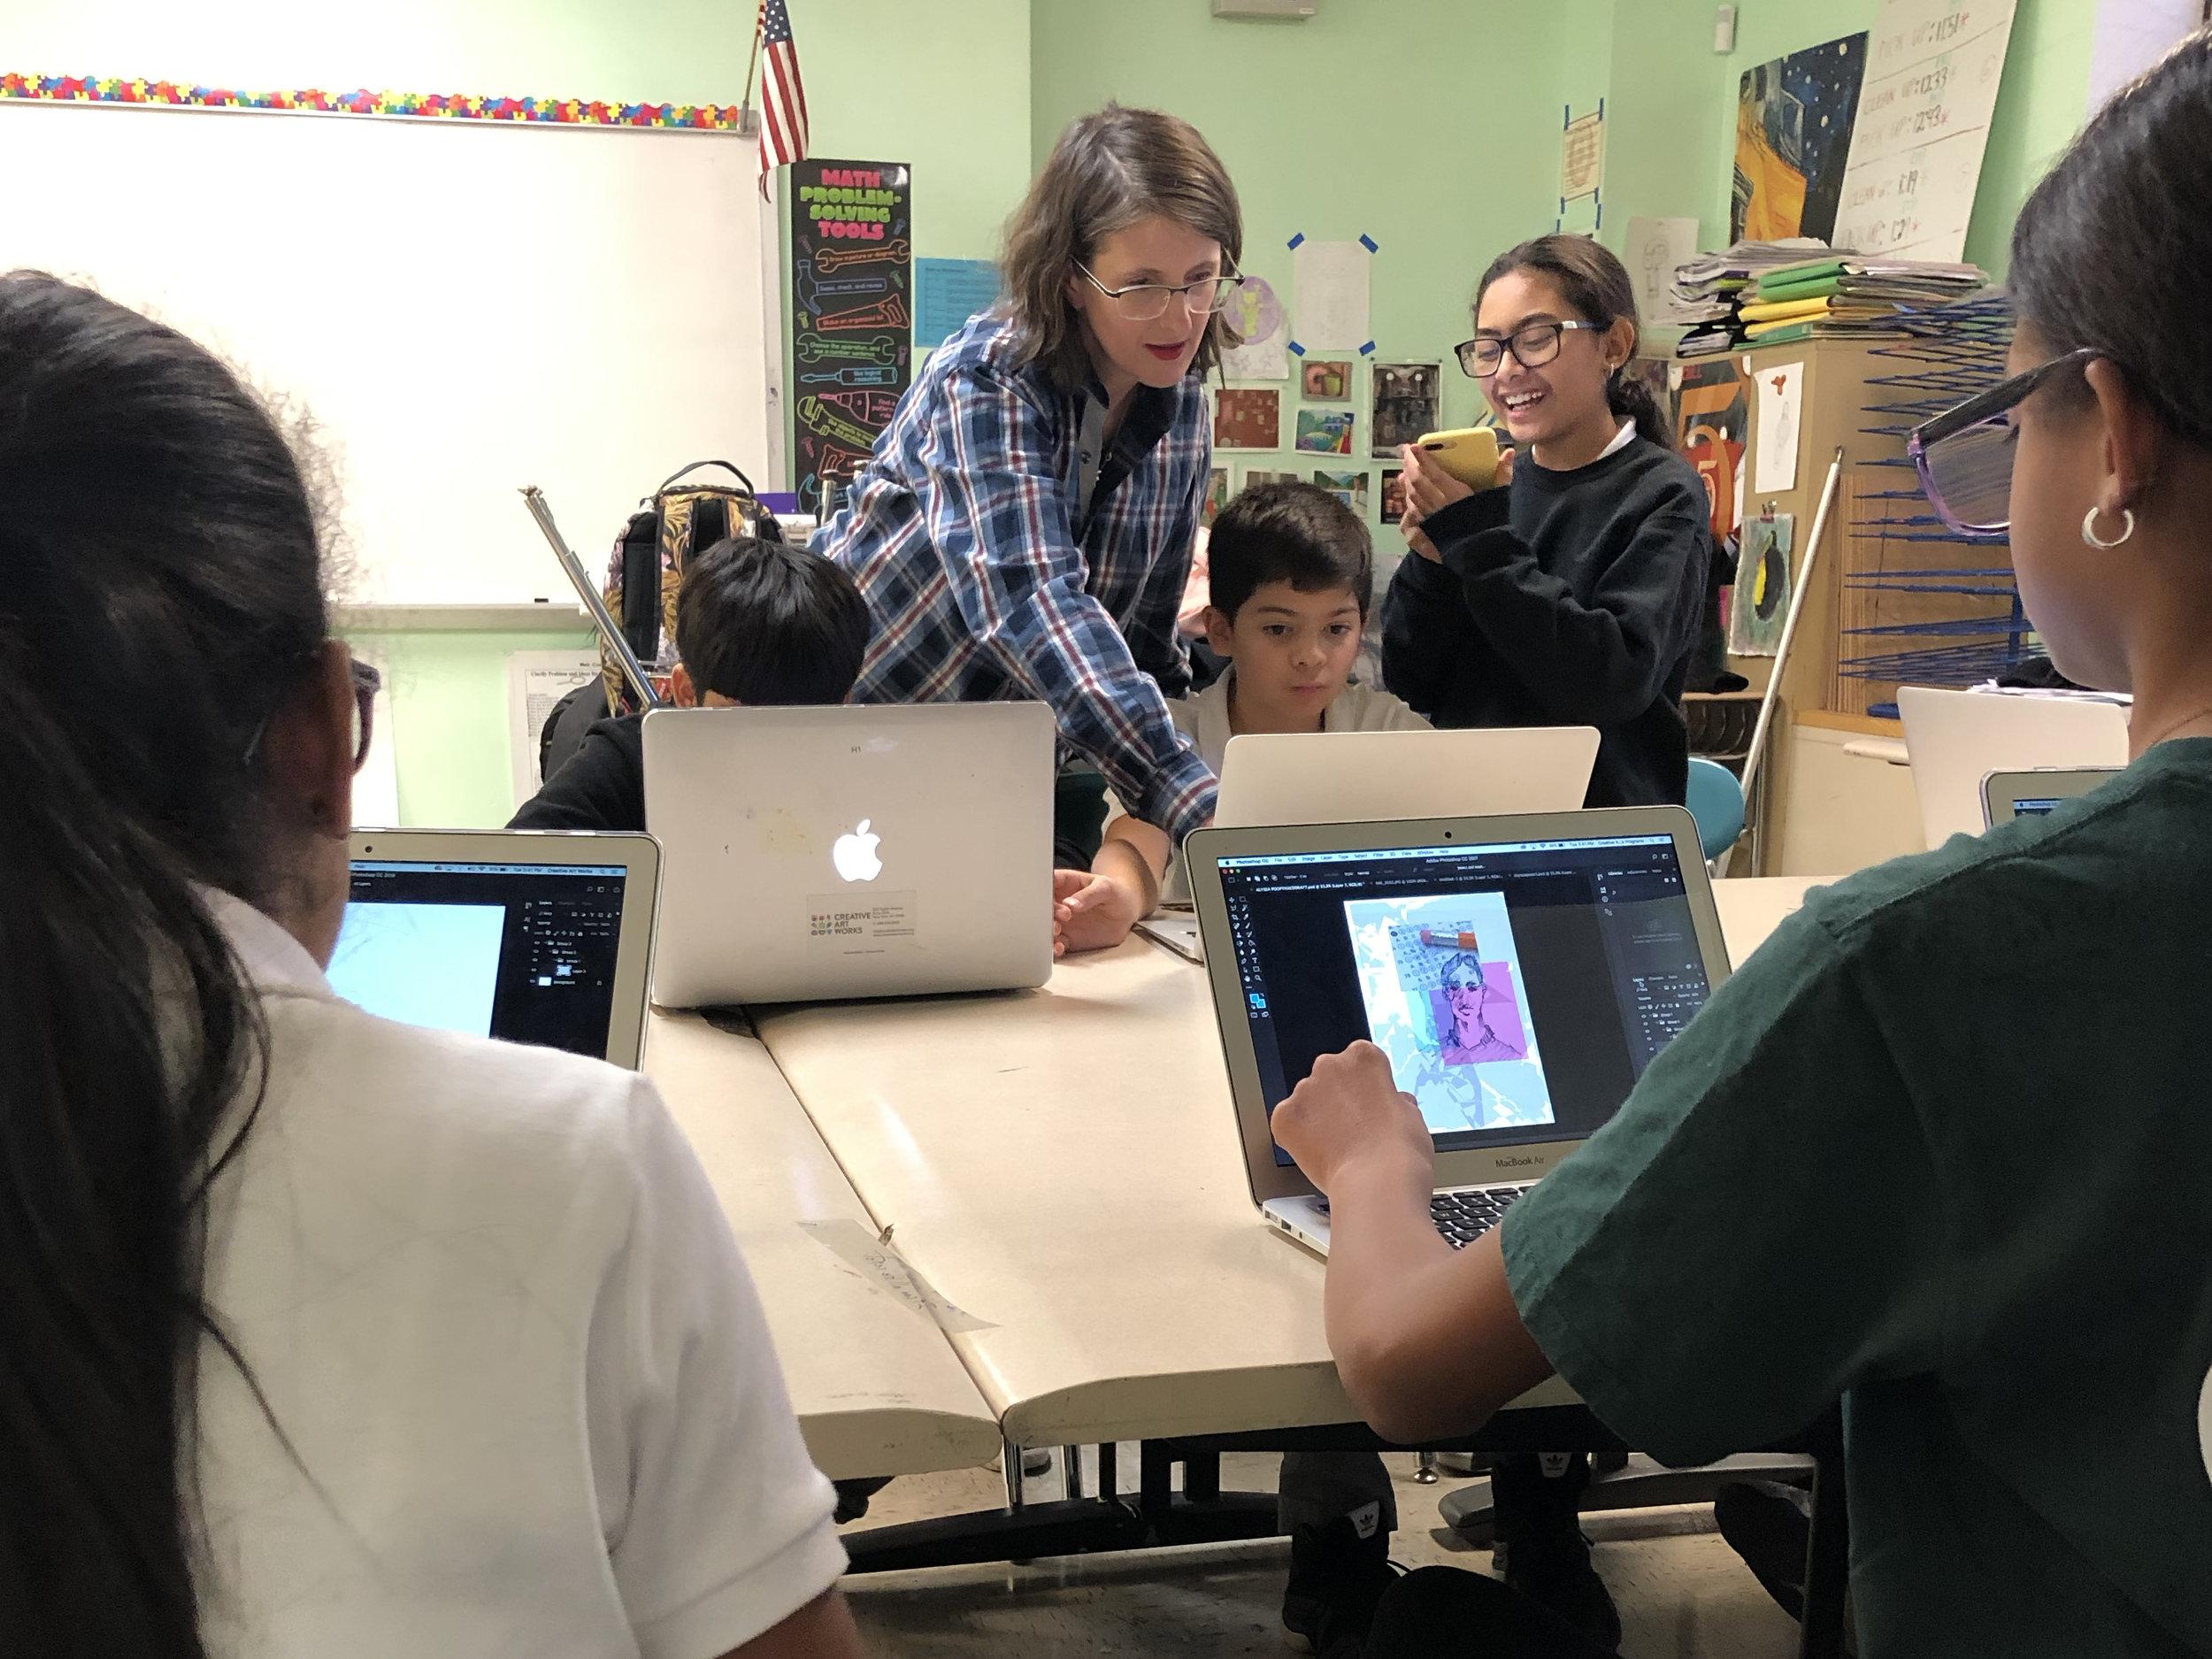 Teaching Artist Brandi Martin Yu with students in the Digital Arts program at PSMS 278.